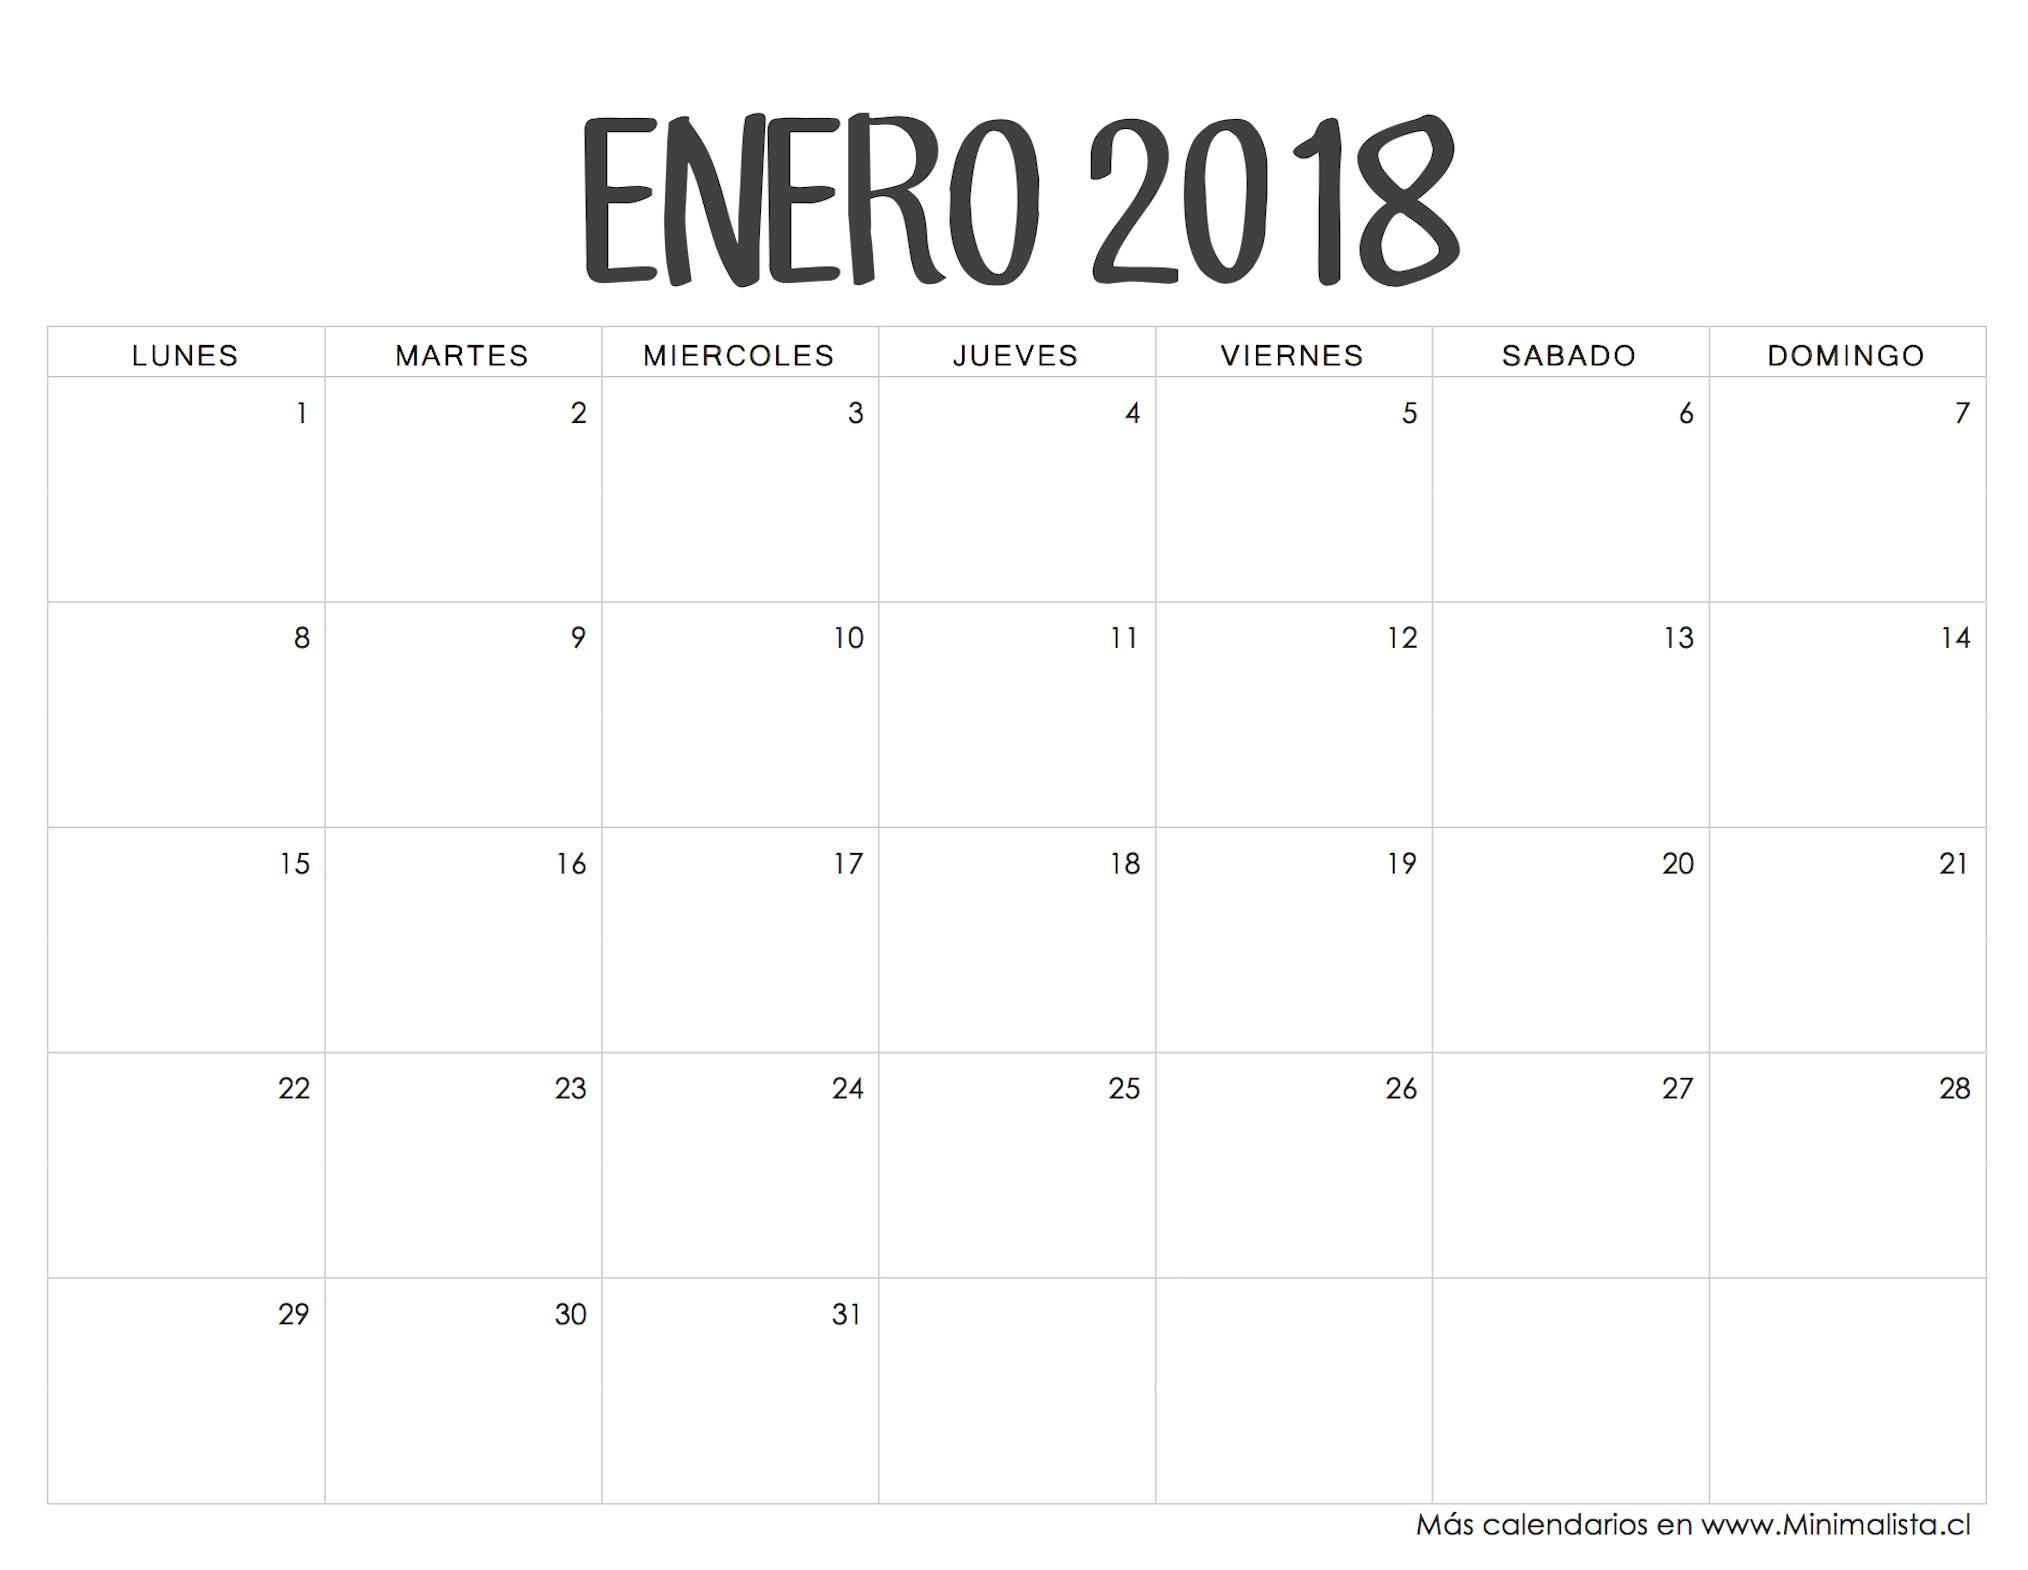 Calendario 2017 Chile Imprimir Por Mes Más Populares Calendarios 2018 Para Imprimir – Minimalista Of Calendario 2017 Chile Imprimir Por Mes Más Reciente 2019 2018 Calendar Printable with Holidays List Kalender Kalendar